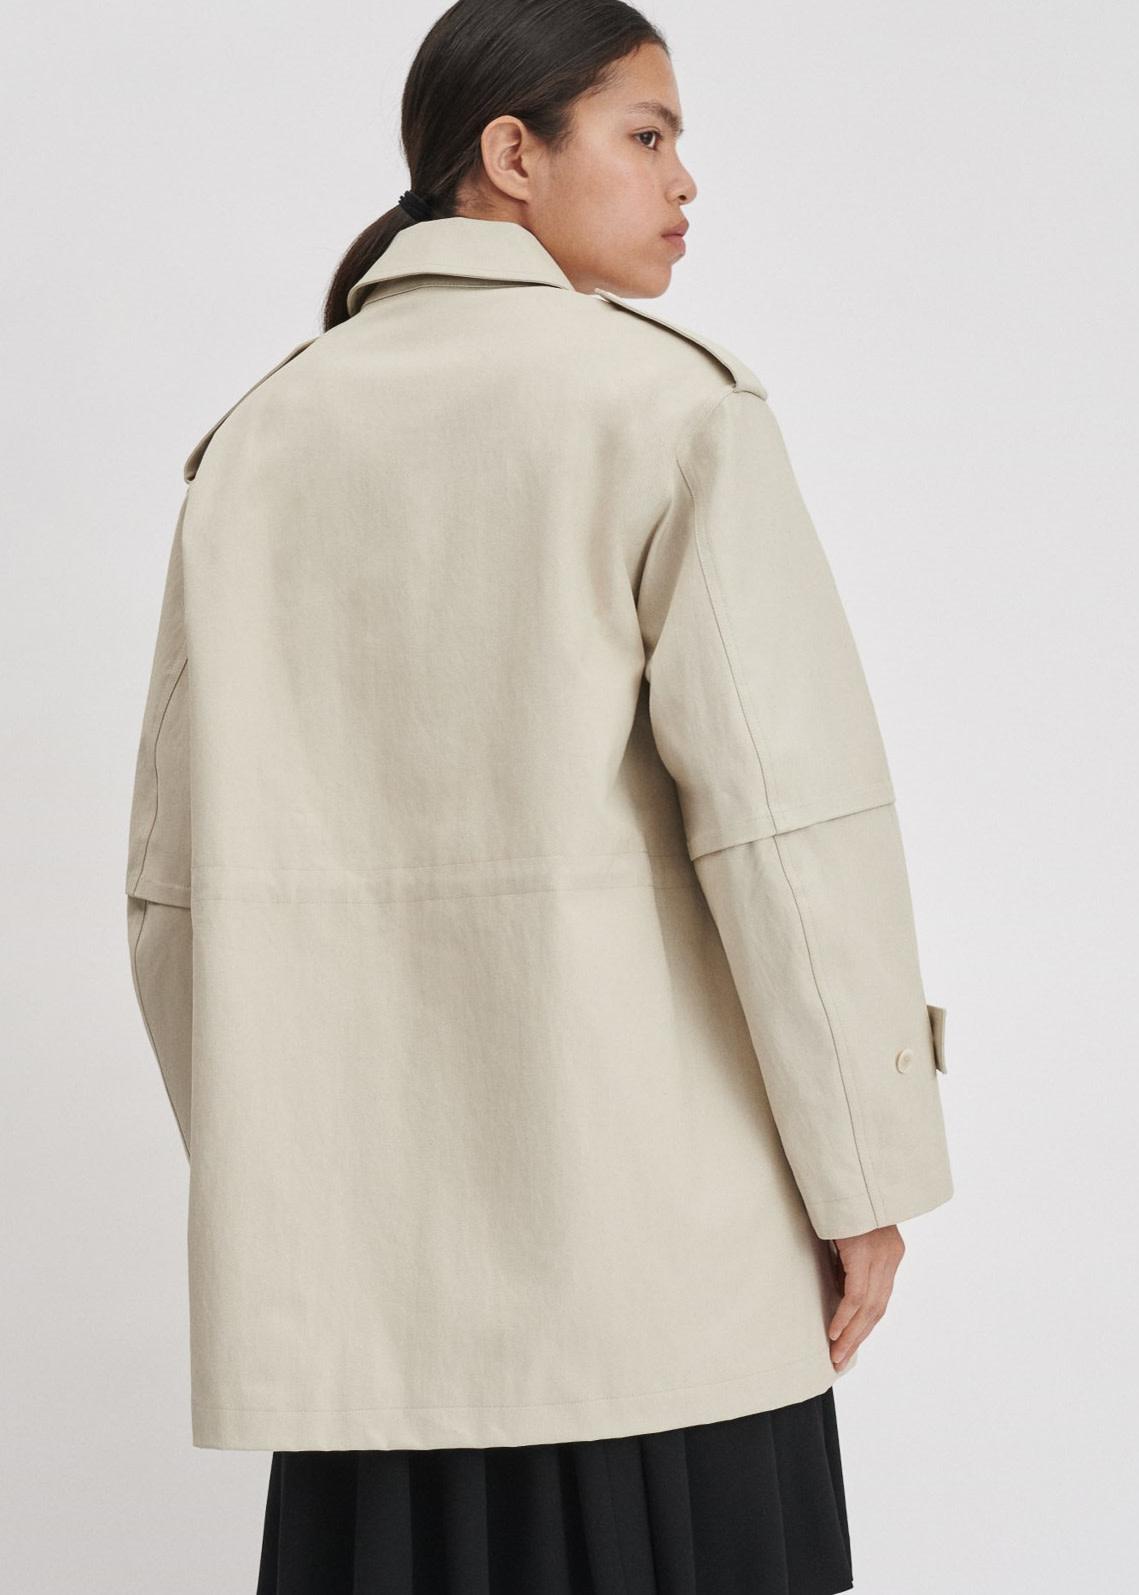 Filippa K Tribeca Coat ivory